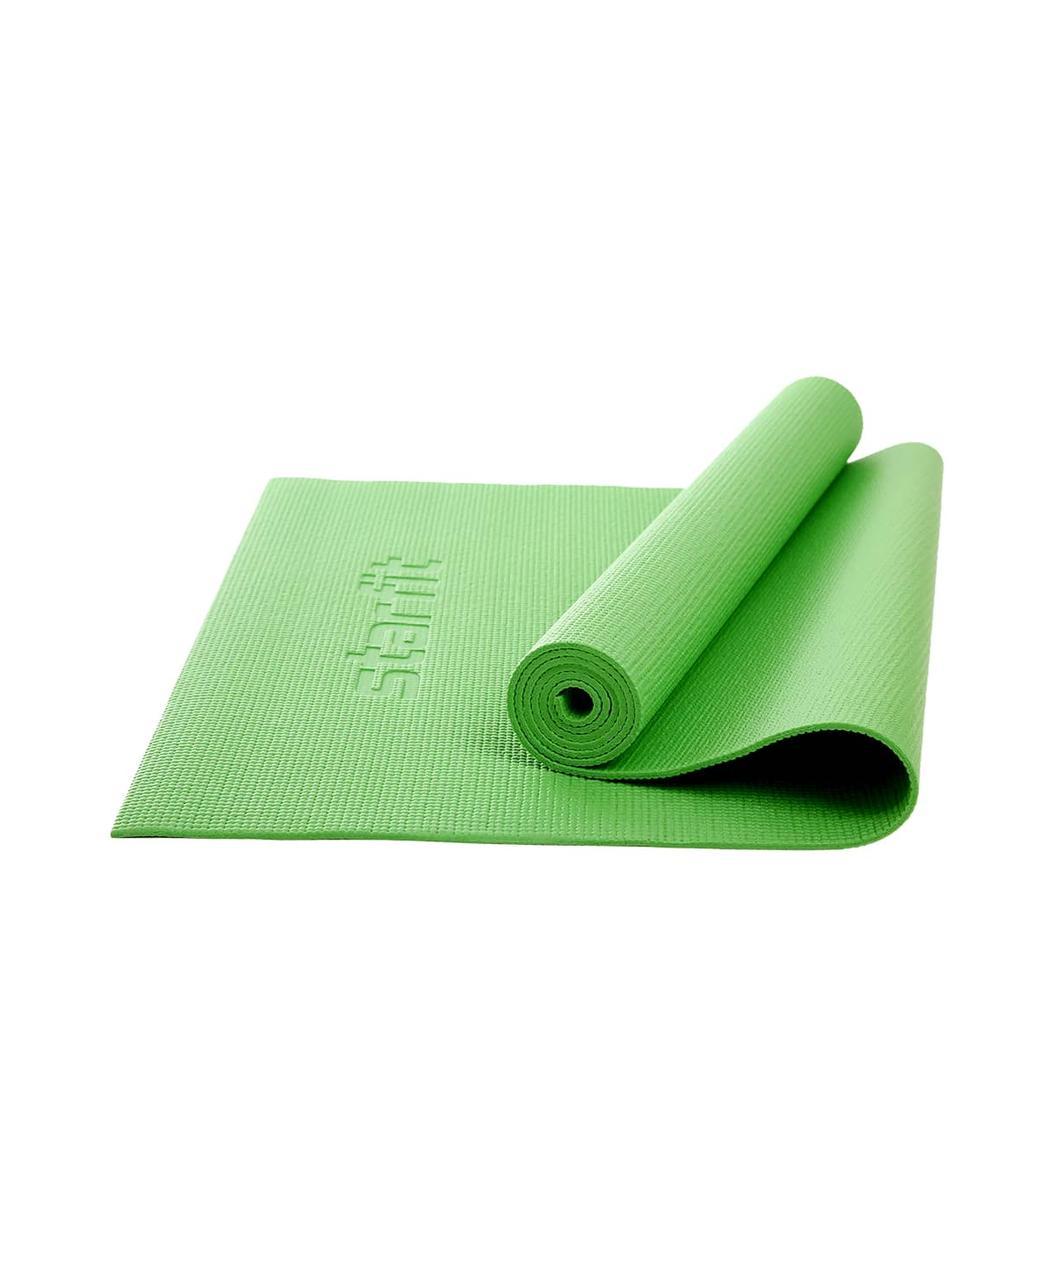 Коврик для йоги 101 0,5 см, Starfit